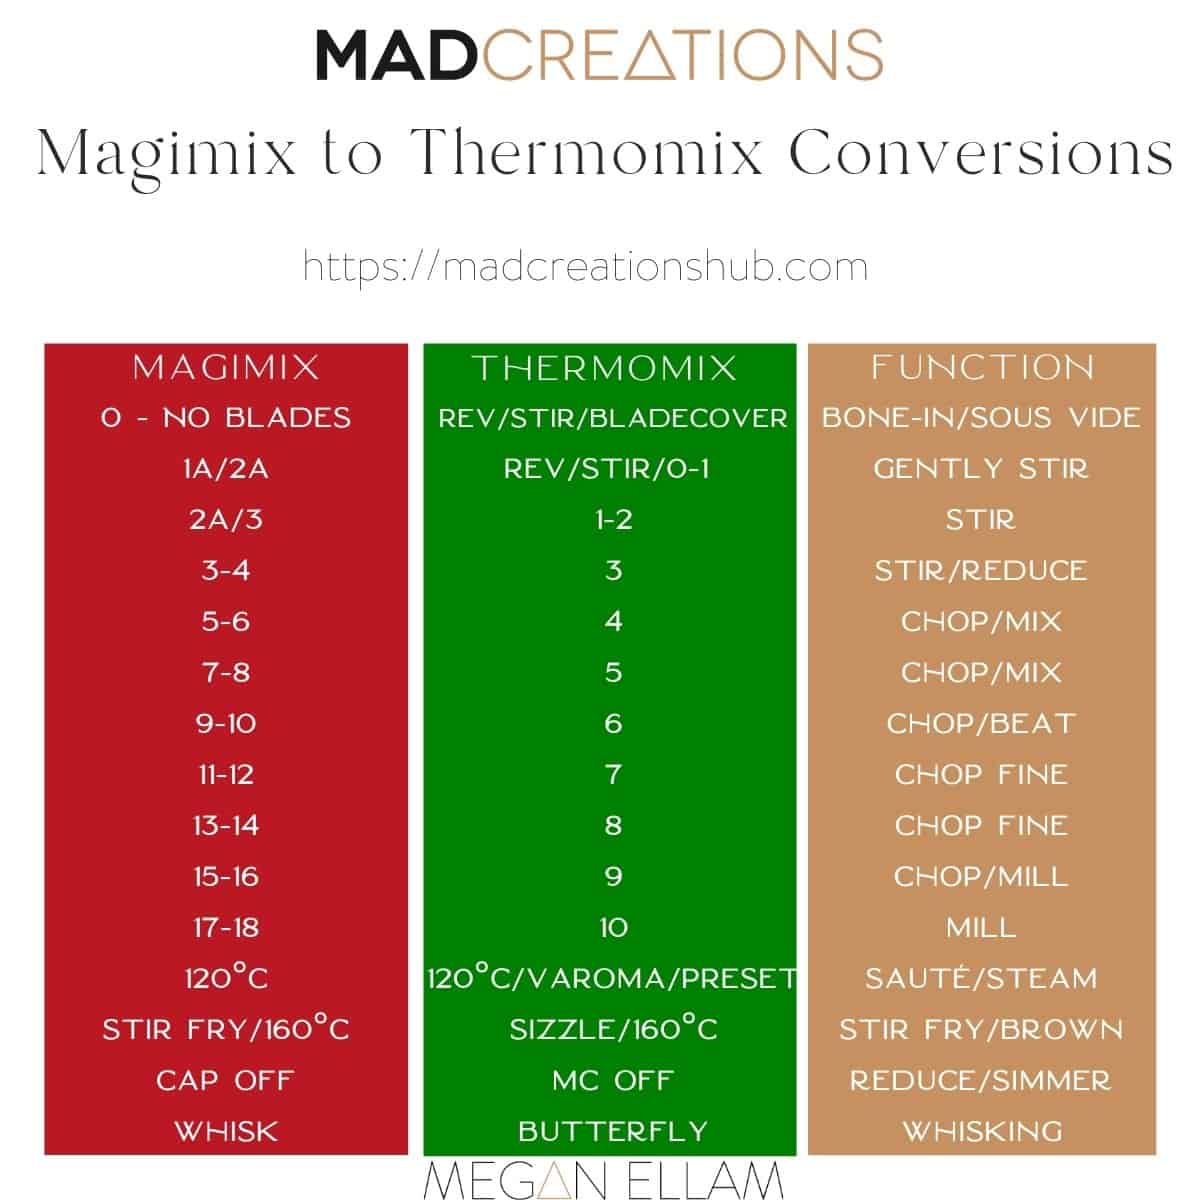 Magimix Cook Expert conversion chart